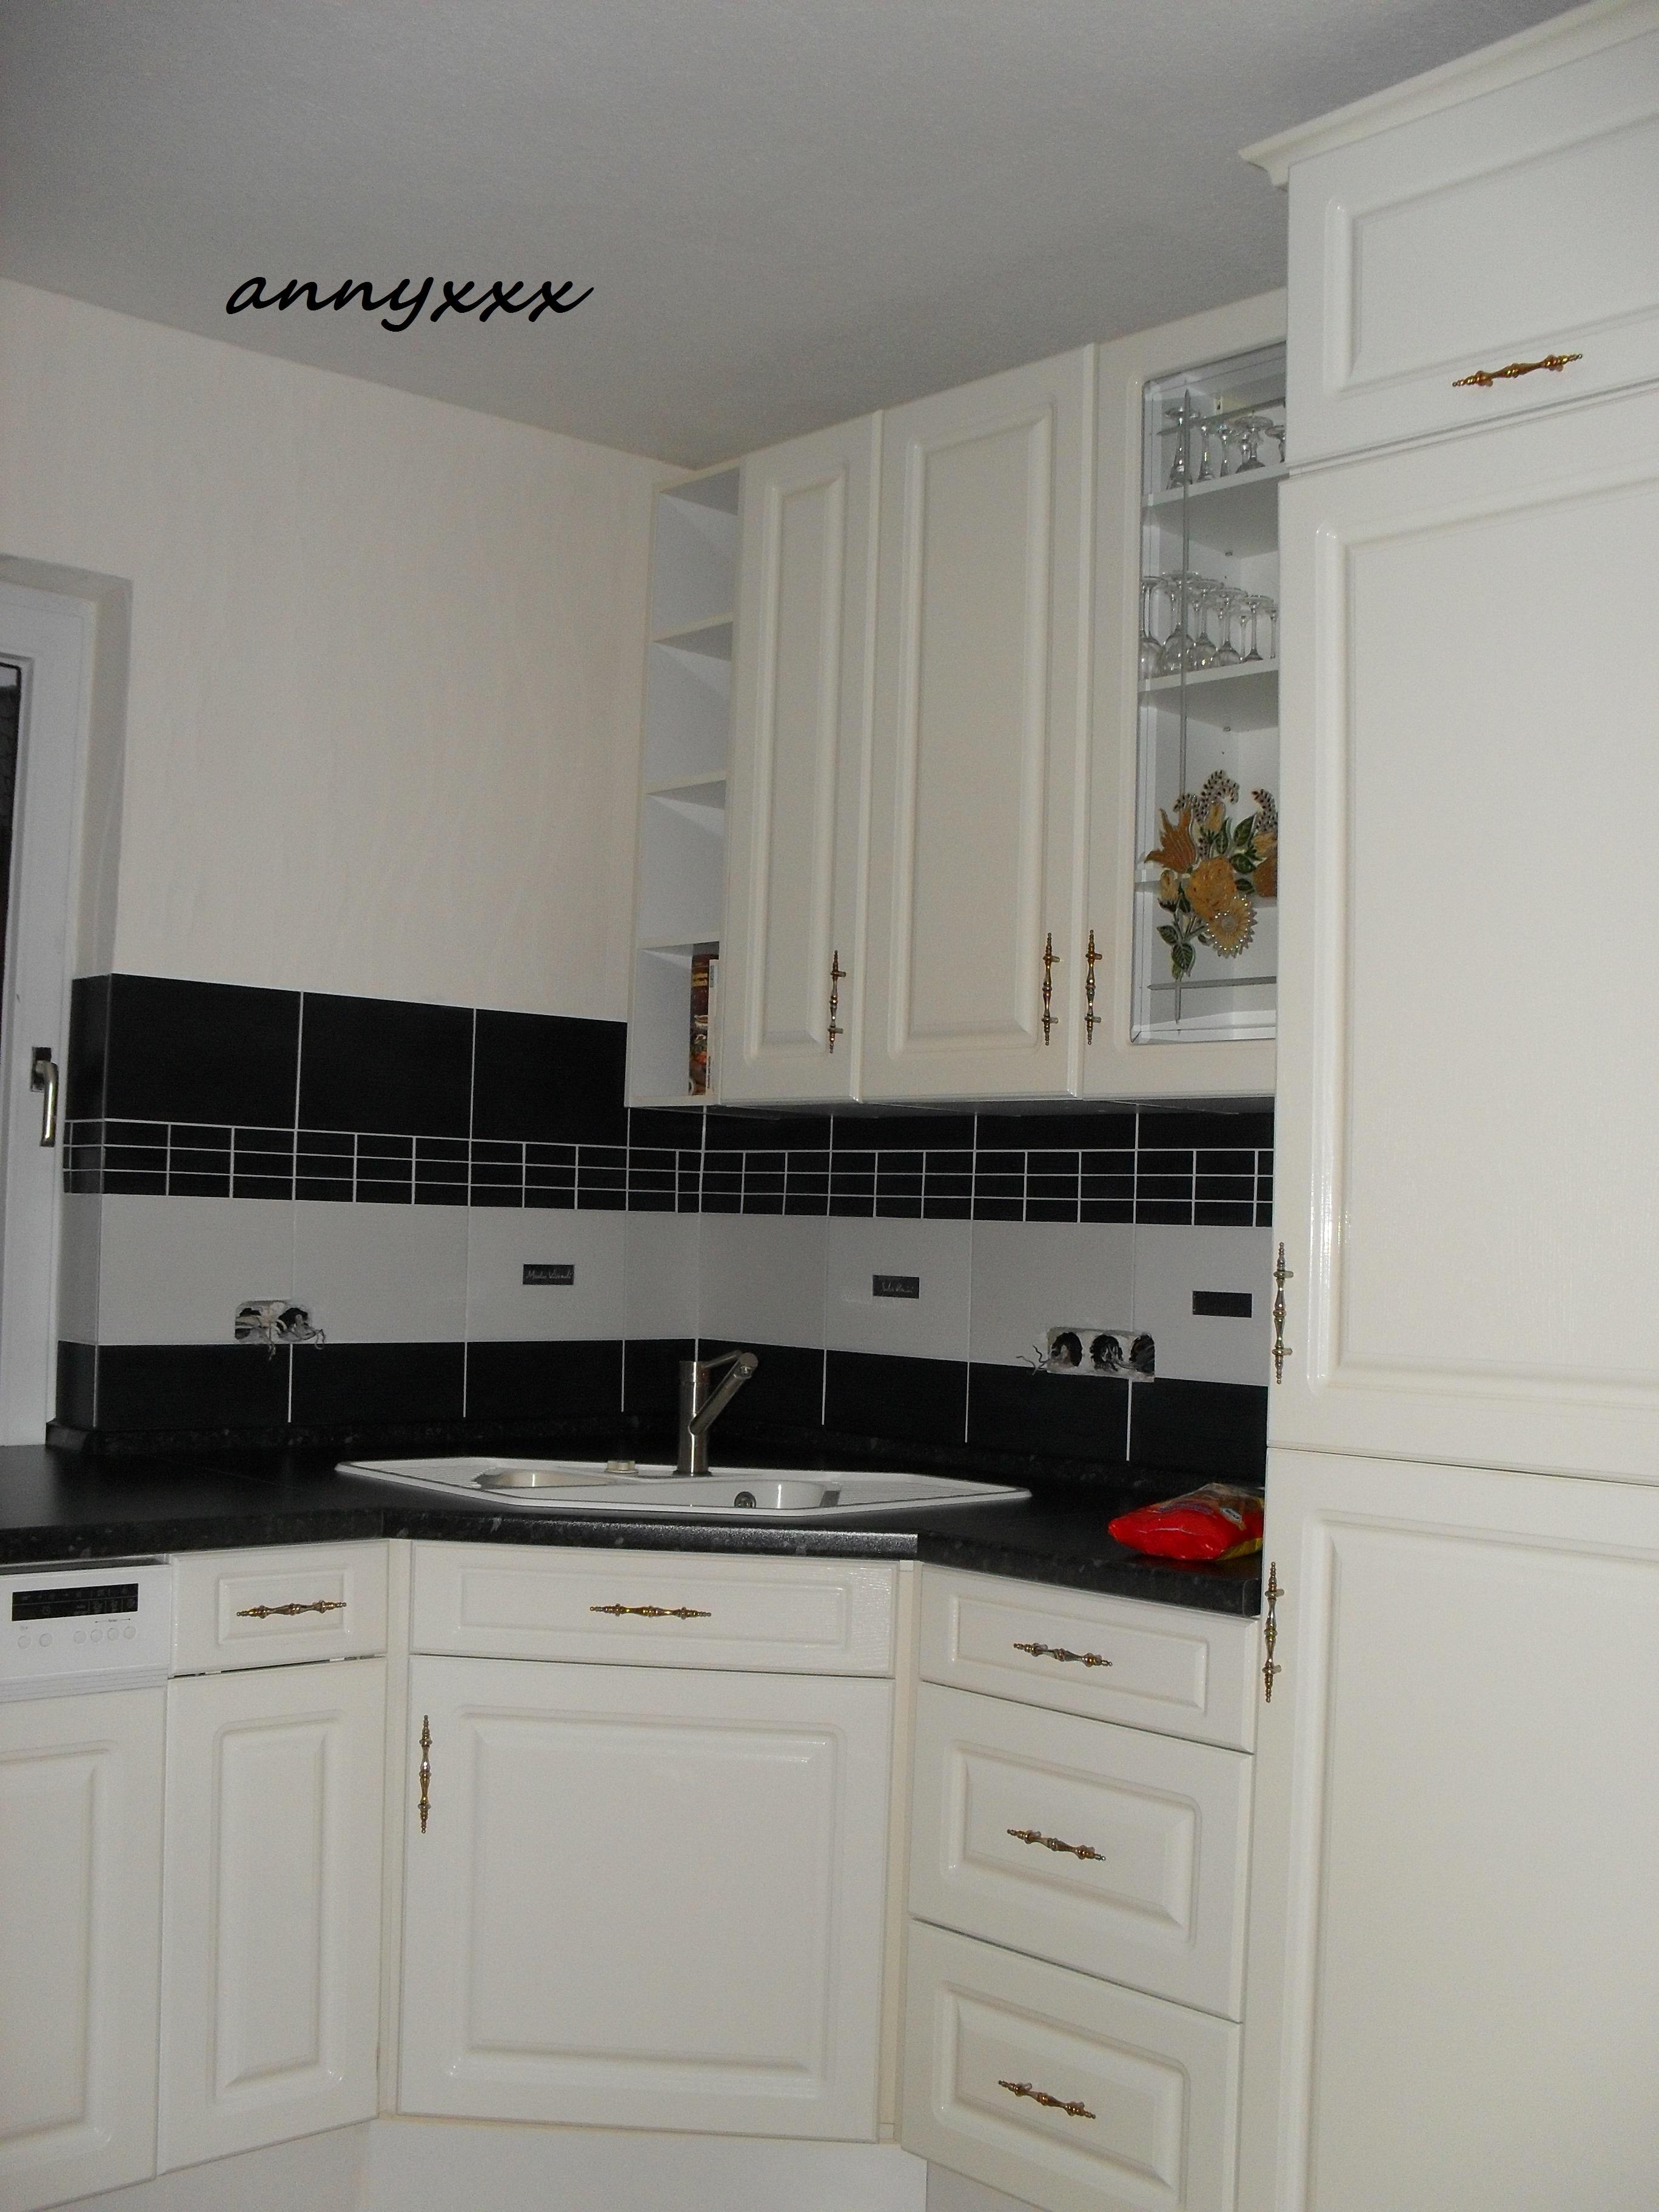 Fliesenspiegel küche höhe  Fliesenspiegel Küche | Jtleigh.com - Hausgestaltung Ideen